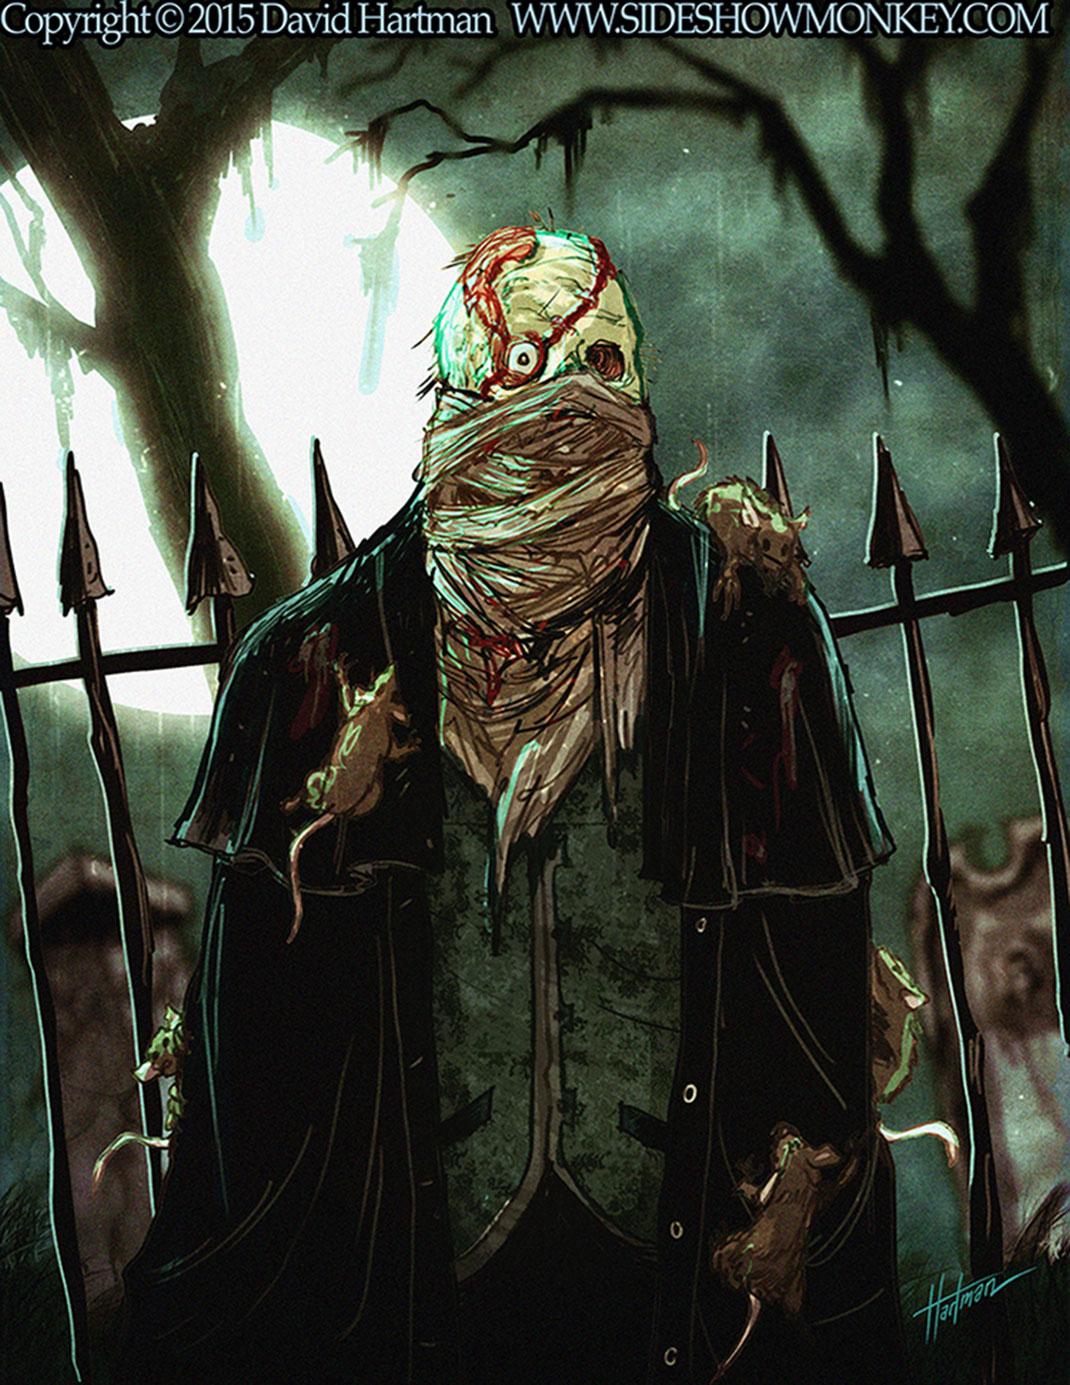 grave_keeper_by_hartman_by_sideshowmonkey-d8sb96o